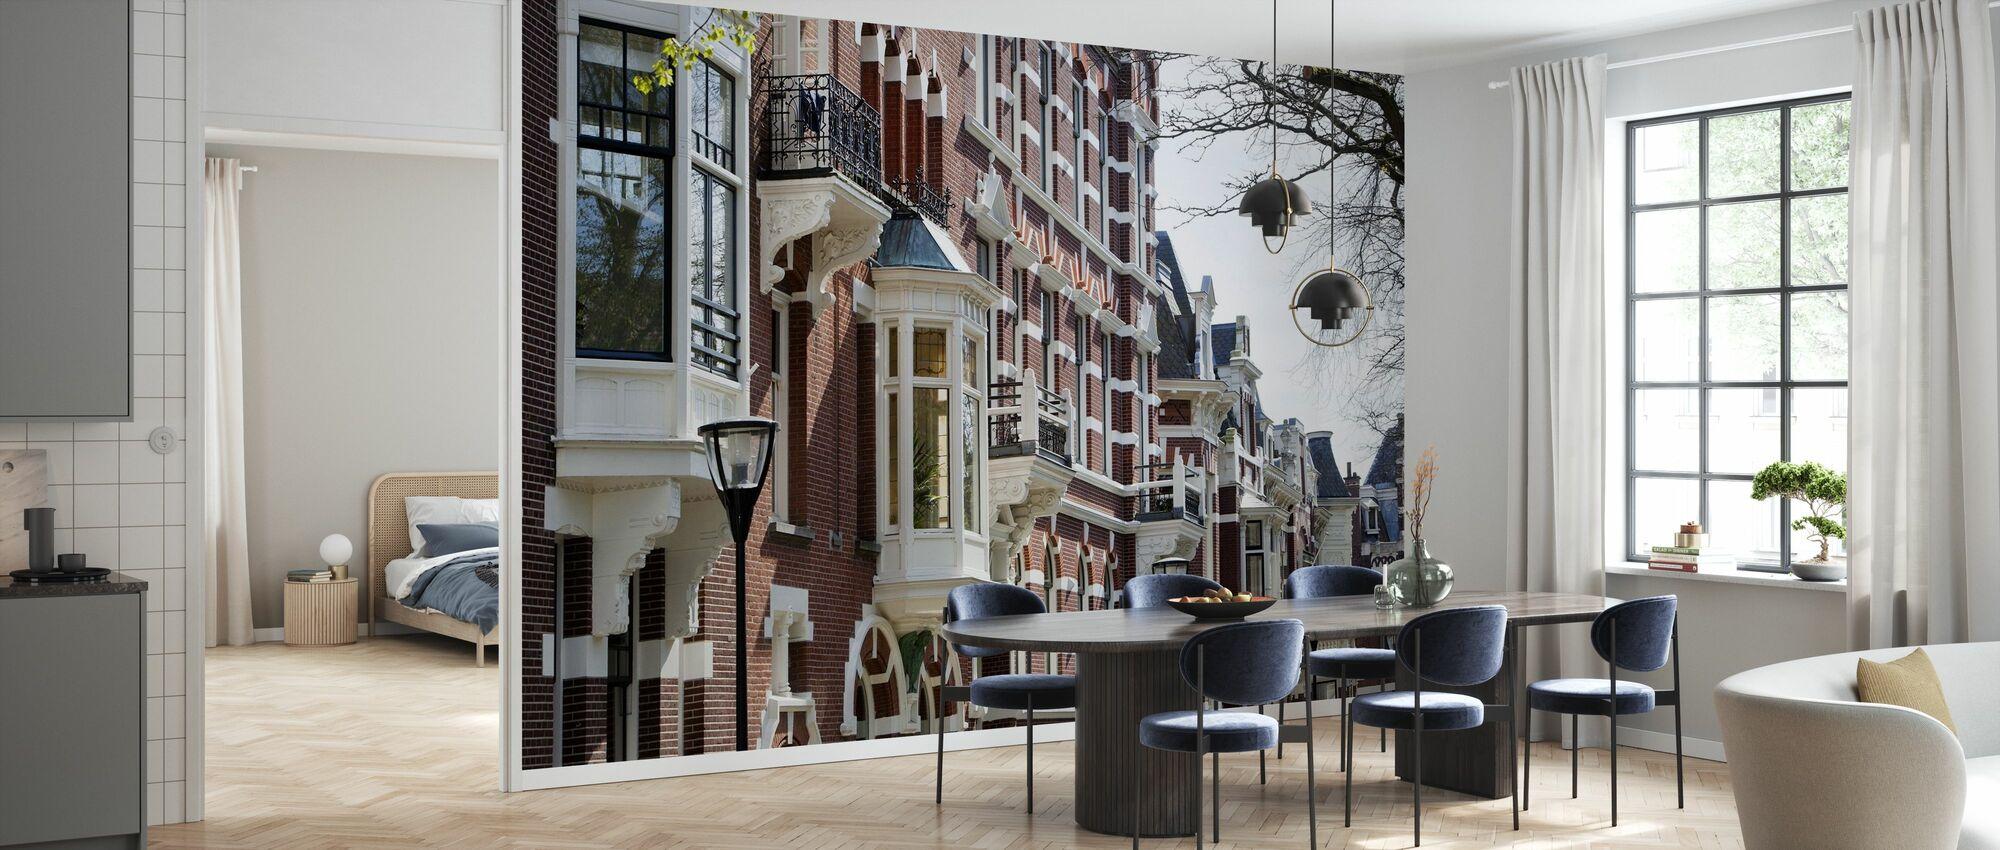 Kralingen in Rotterdam - Wallpaper - Kitchen